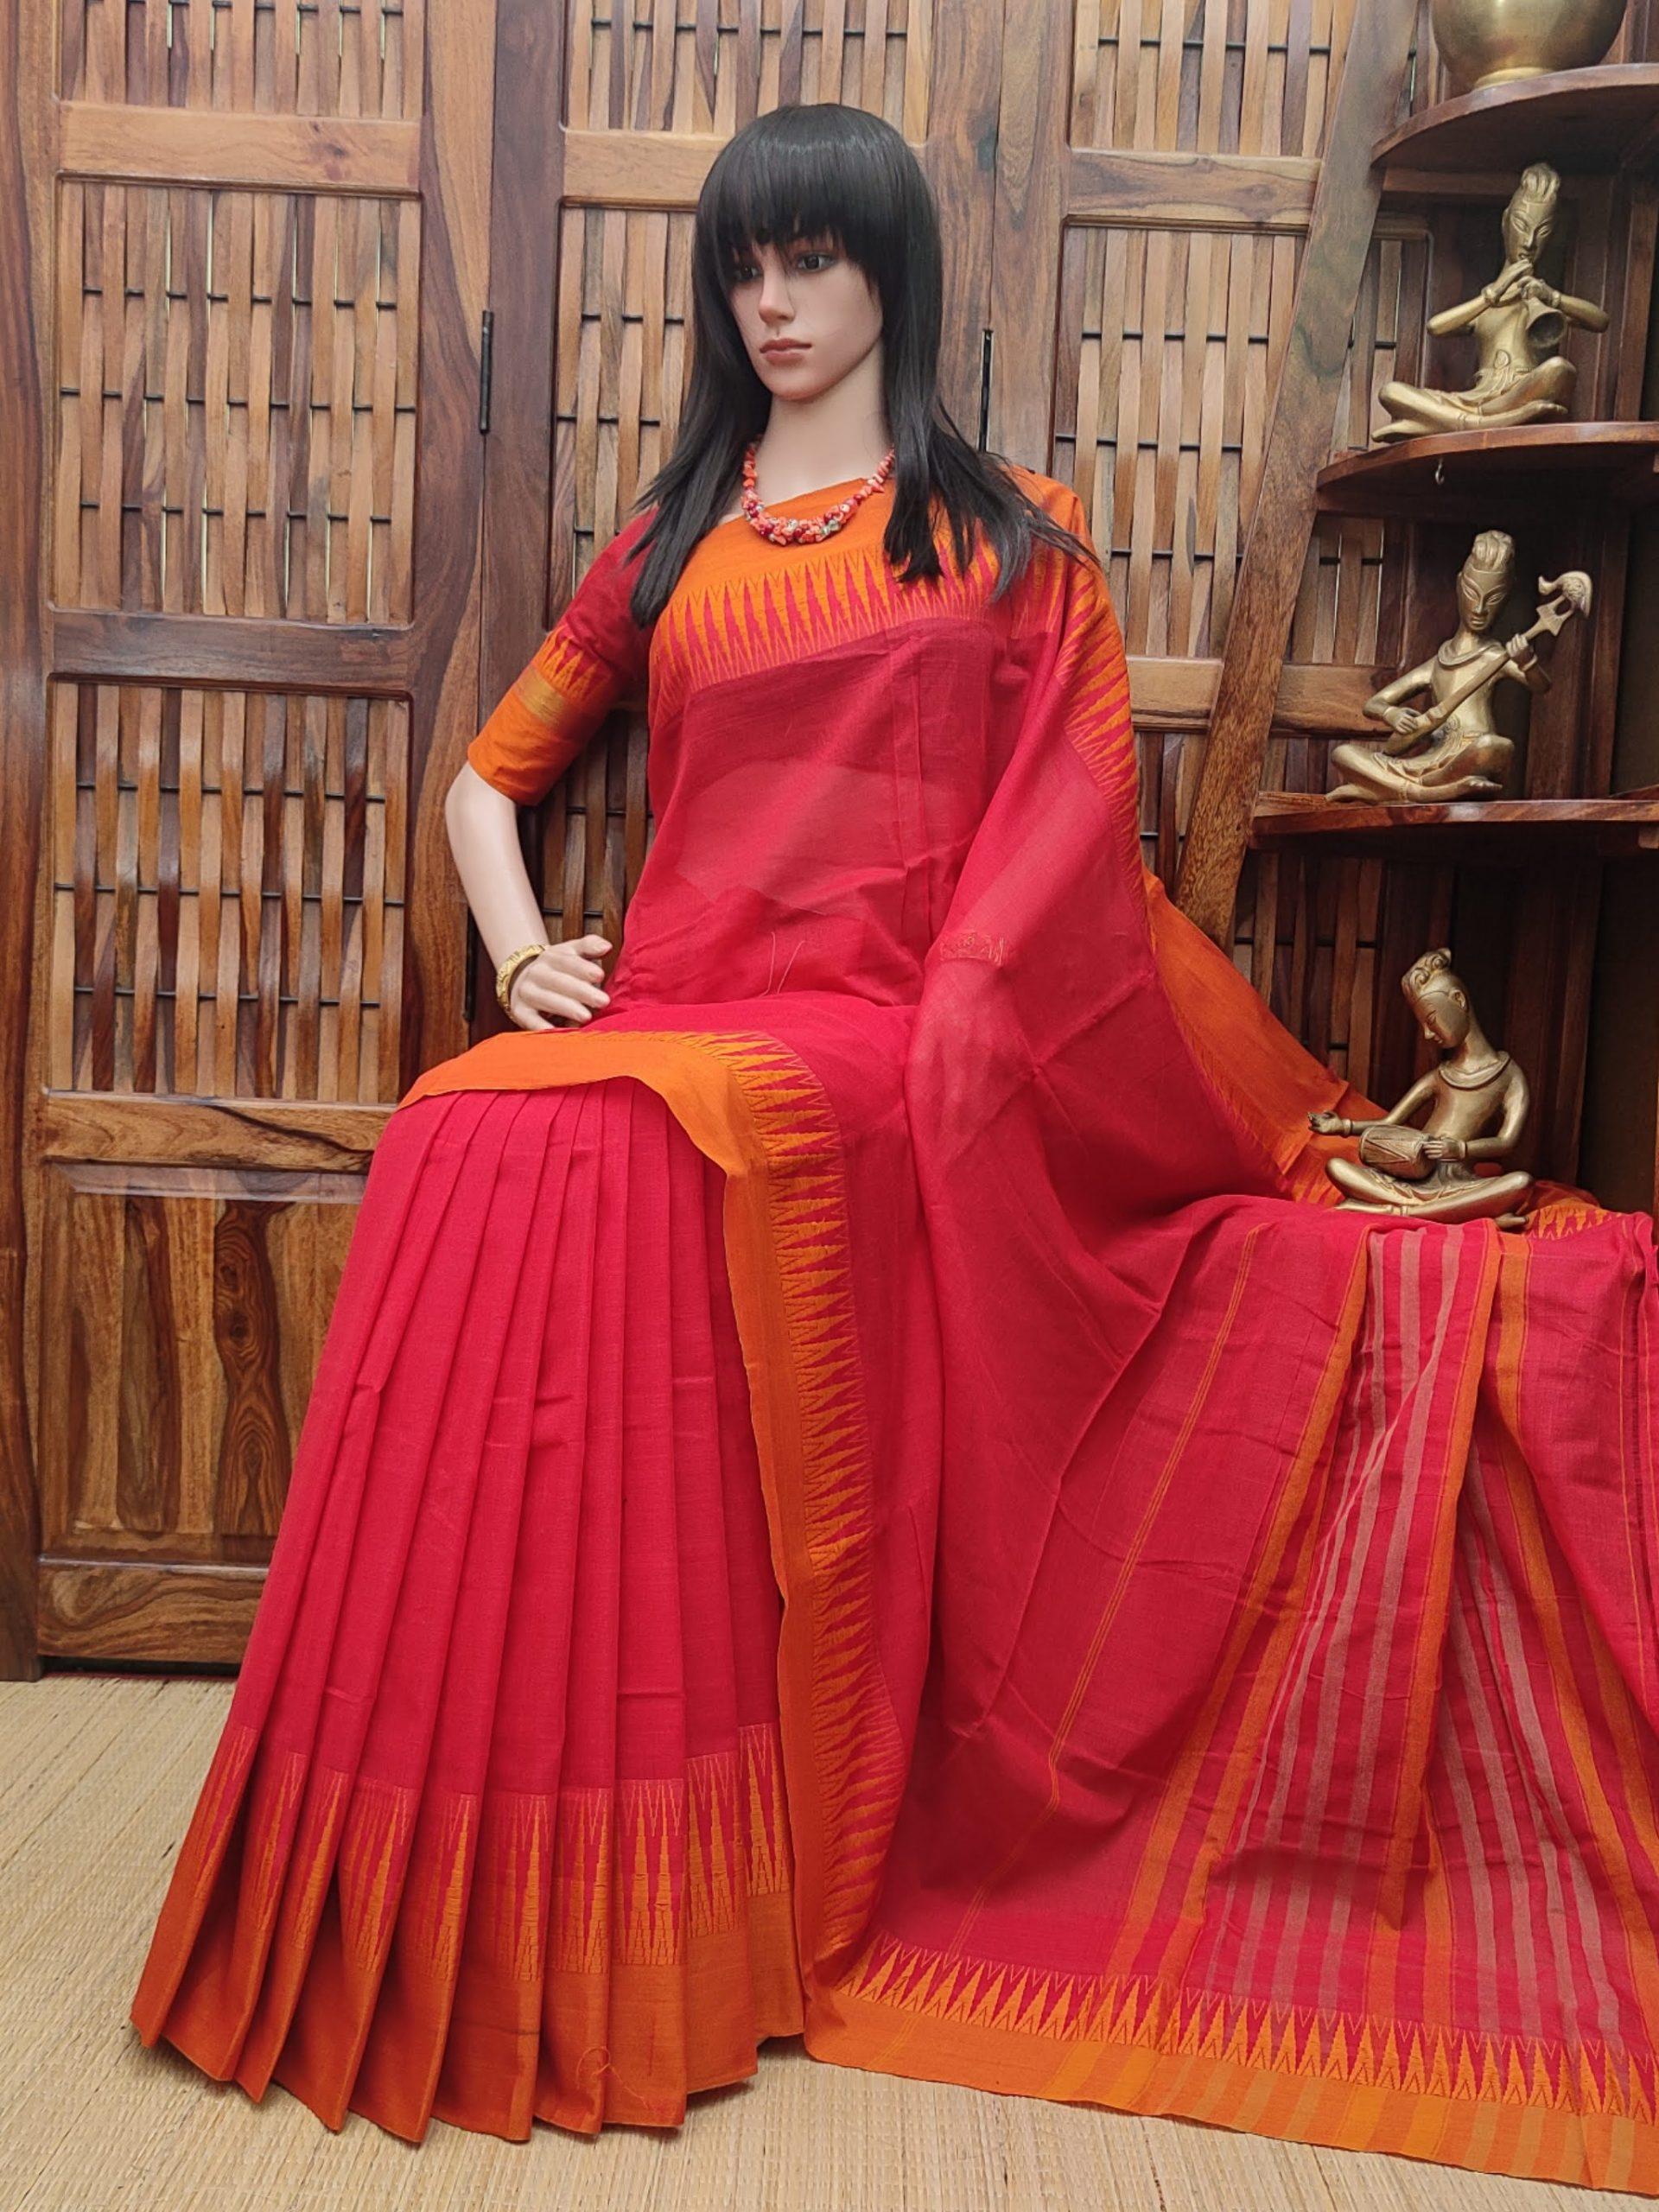 Muditha - Mercerized Pearl Cotton Saree